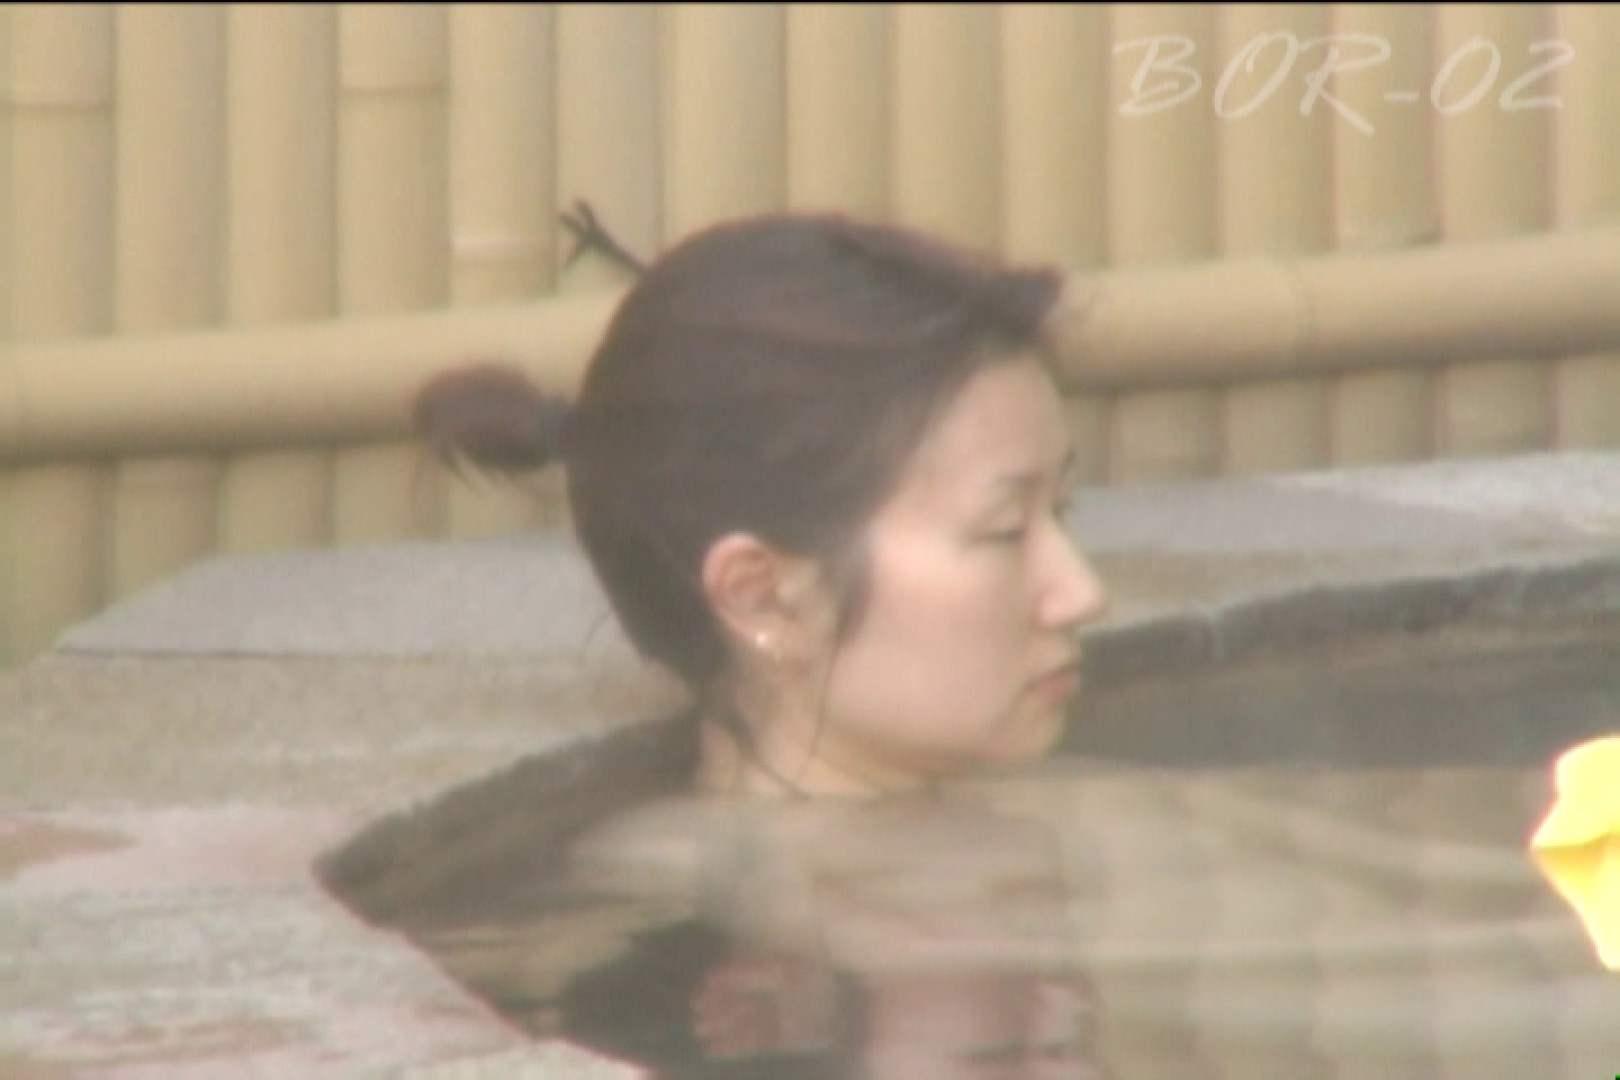 Aquaな露天風呂Vol.477 盗撮シリーズ | 露天風呂編  104PIX 69